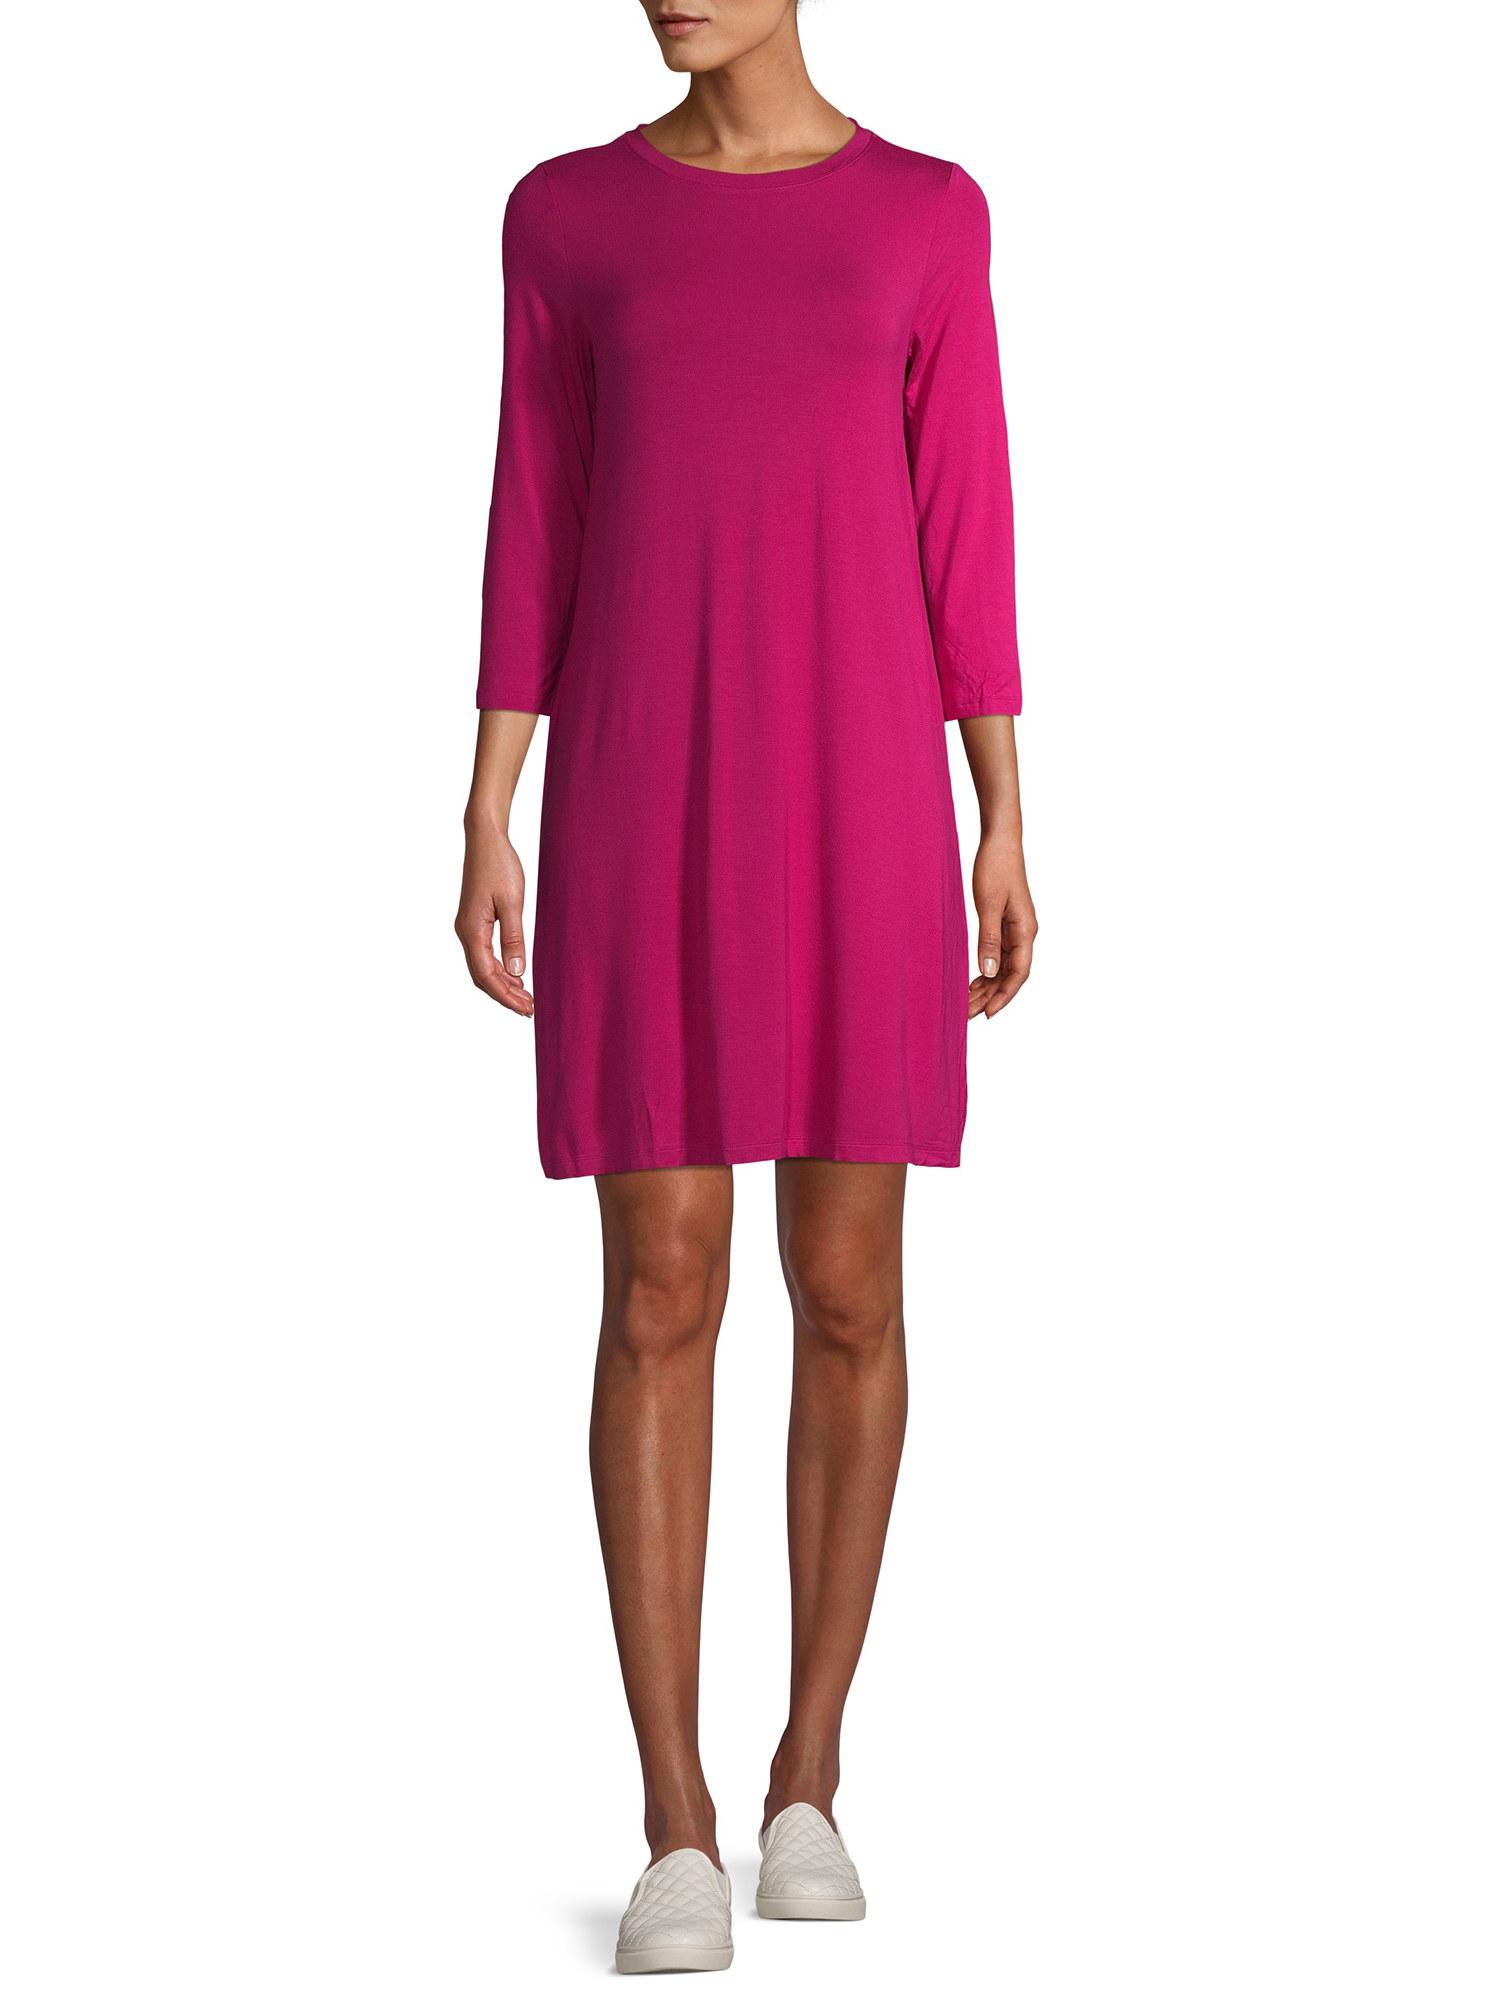 A model in a pink quarter sleeve dress